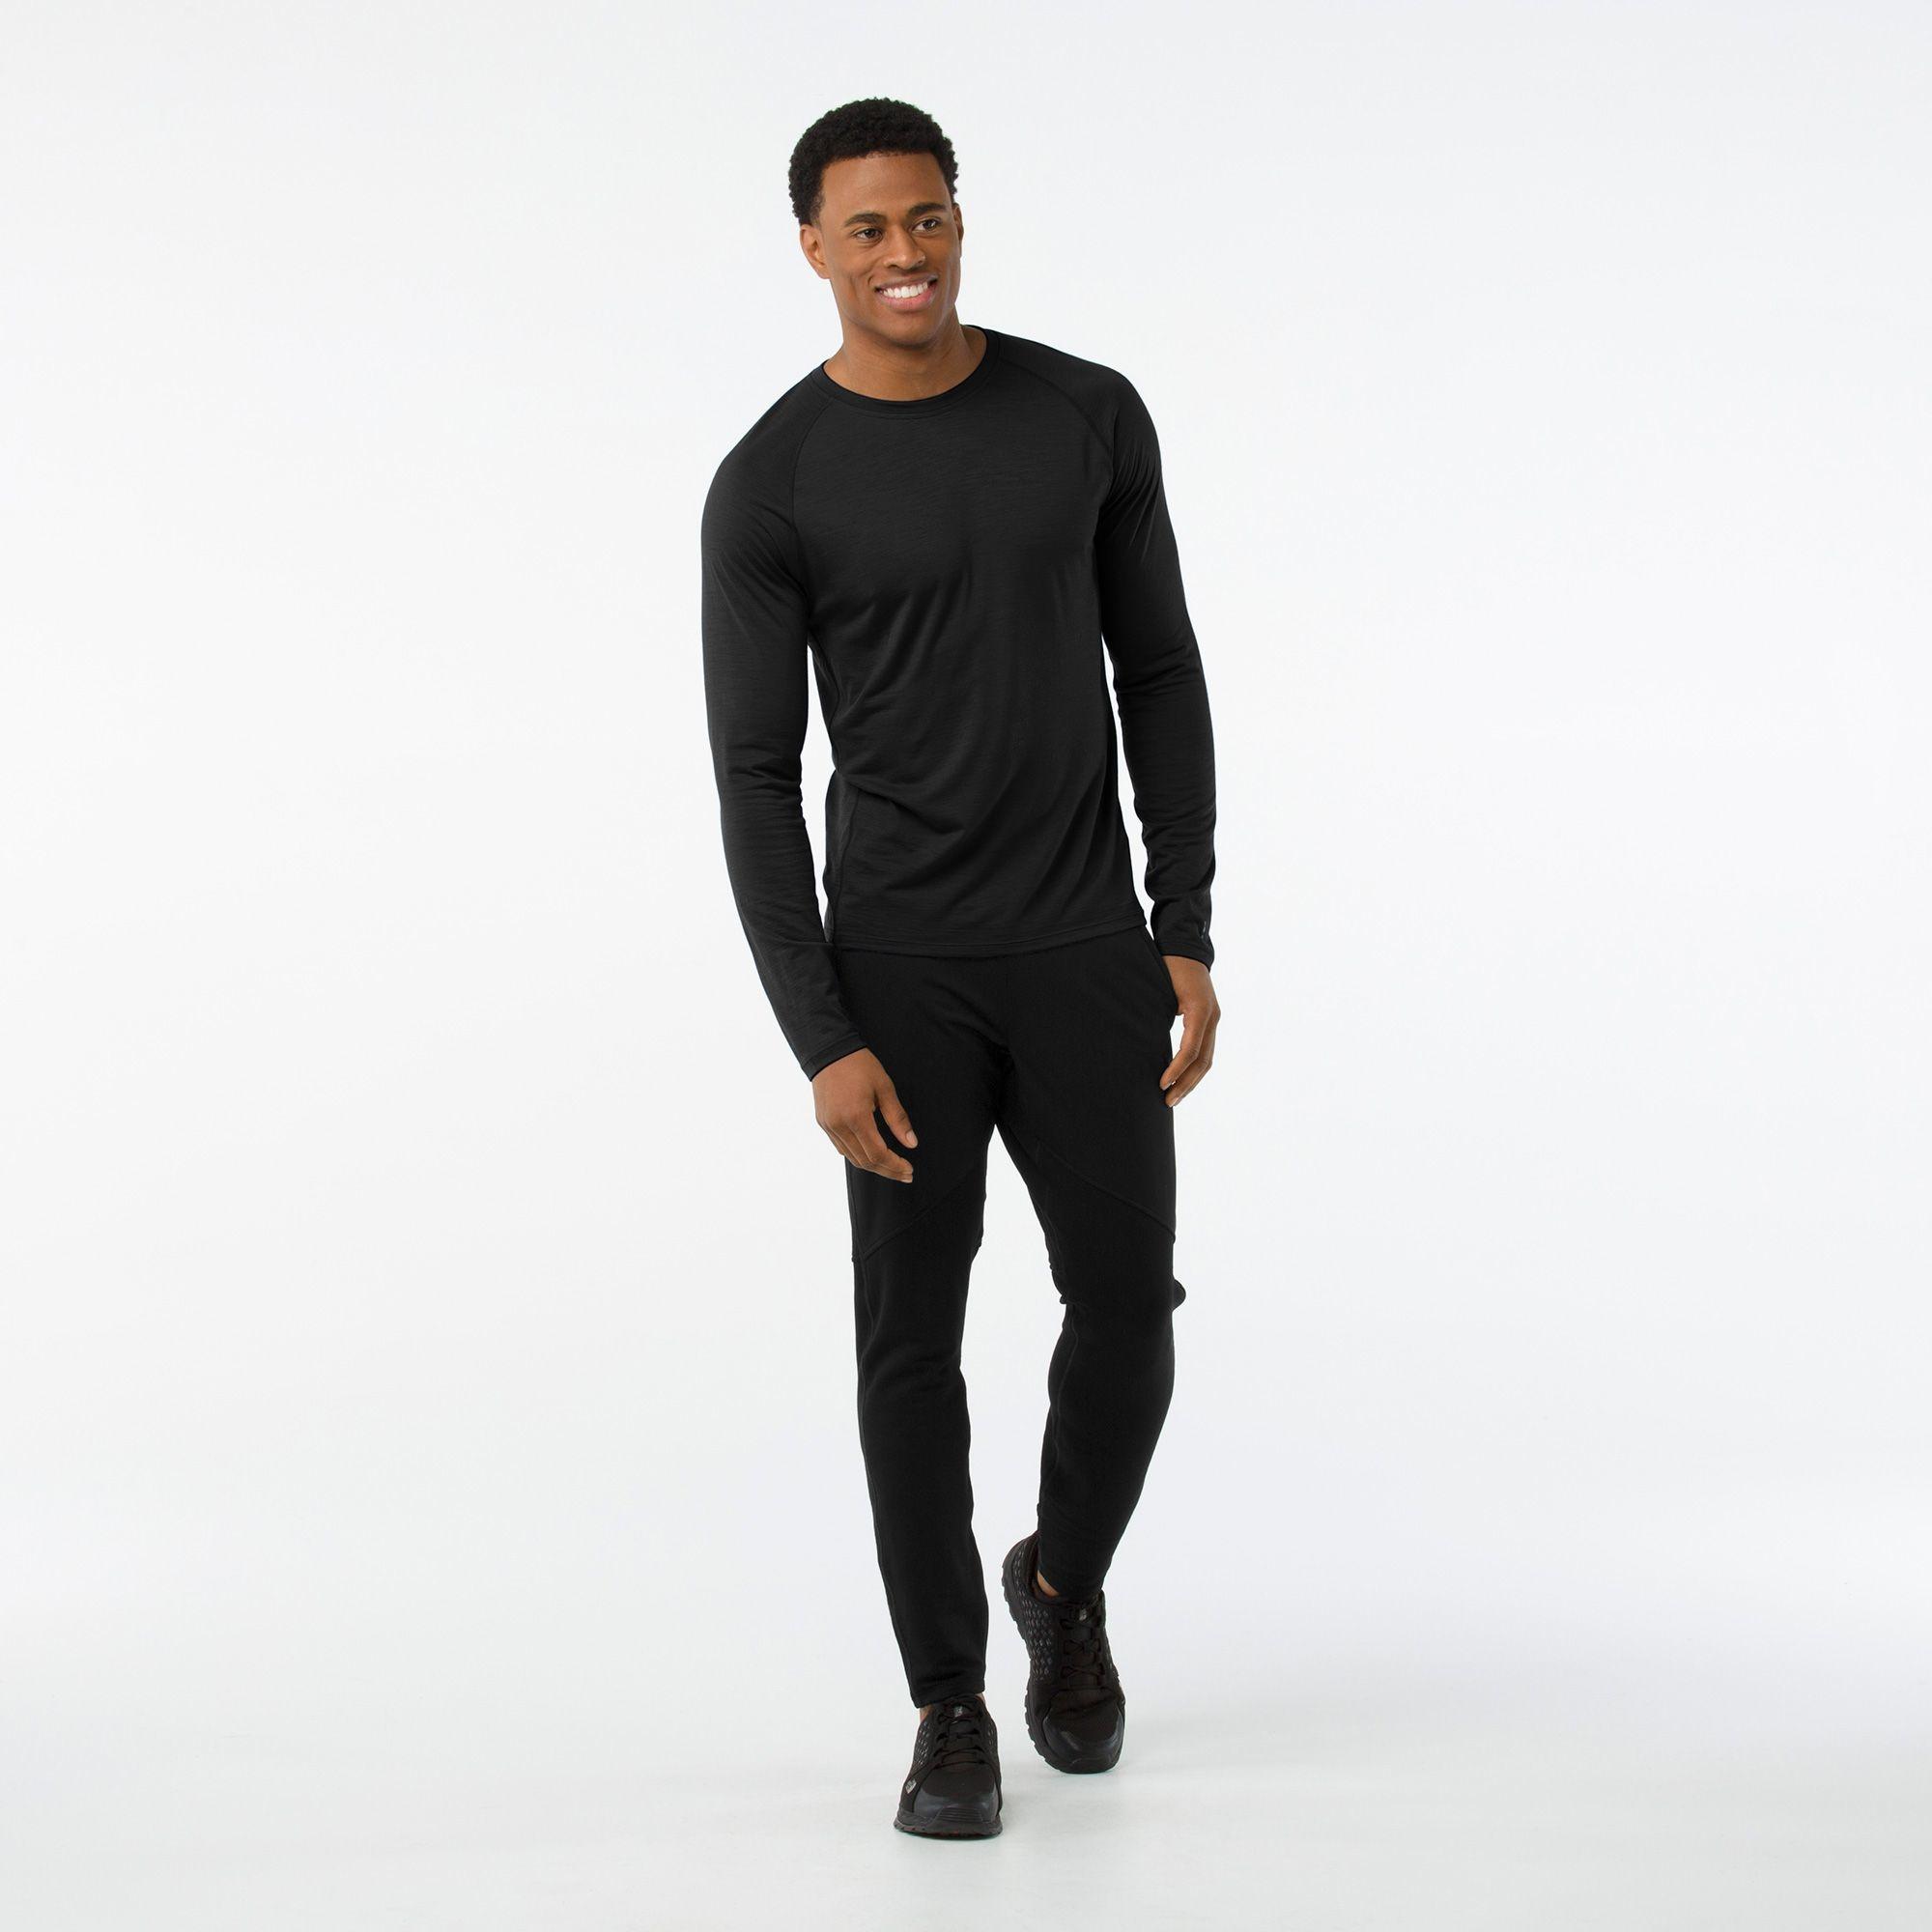 Smartwool Merino 150 Top, Black